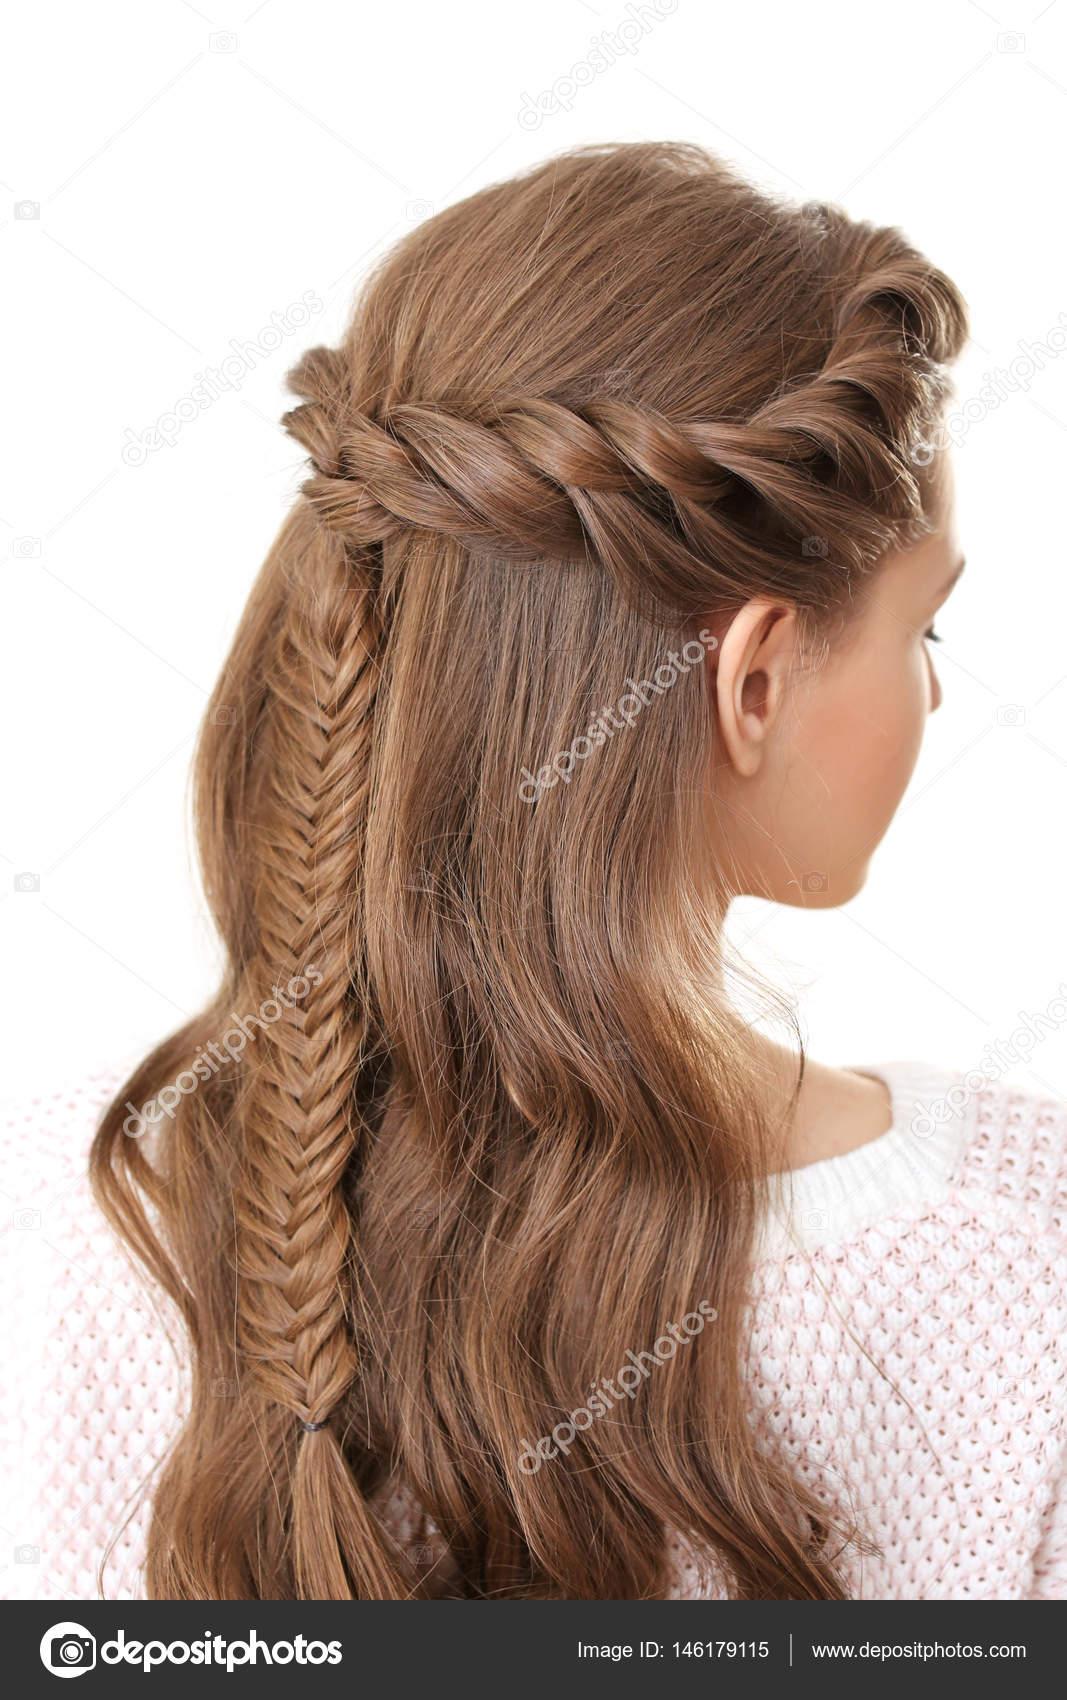 Strange Woman With Nice Braid Hairstyle Stock Photo C Belchonock 146179115 Natural Hairstyles Runnerswayorg